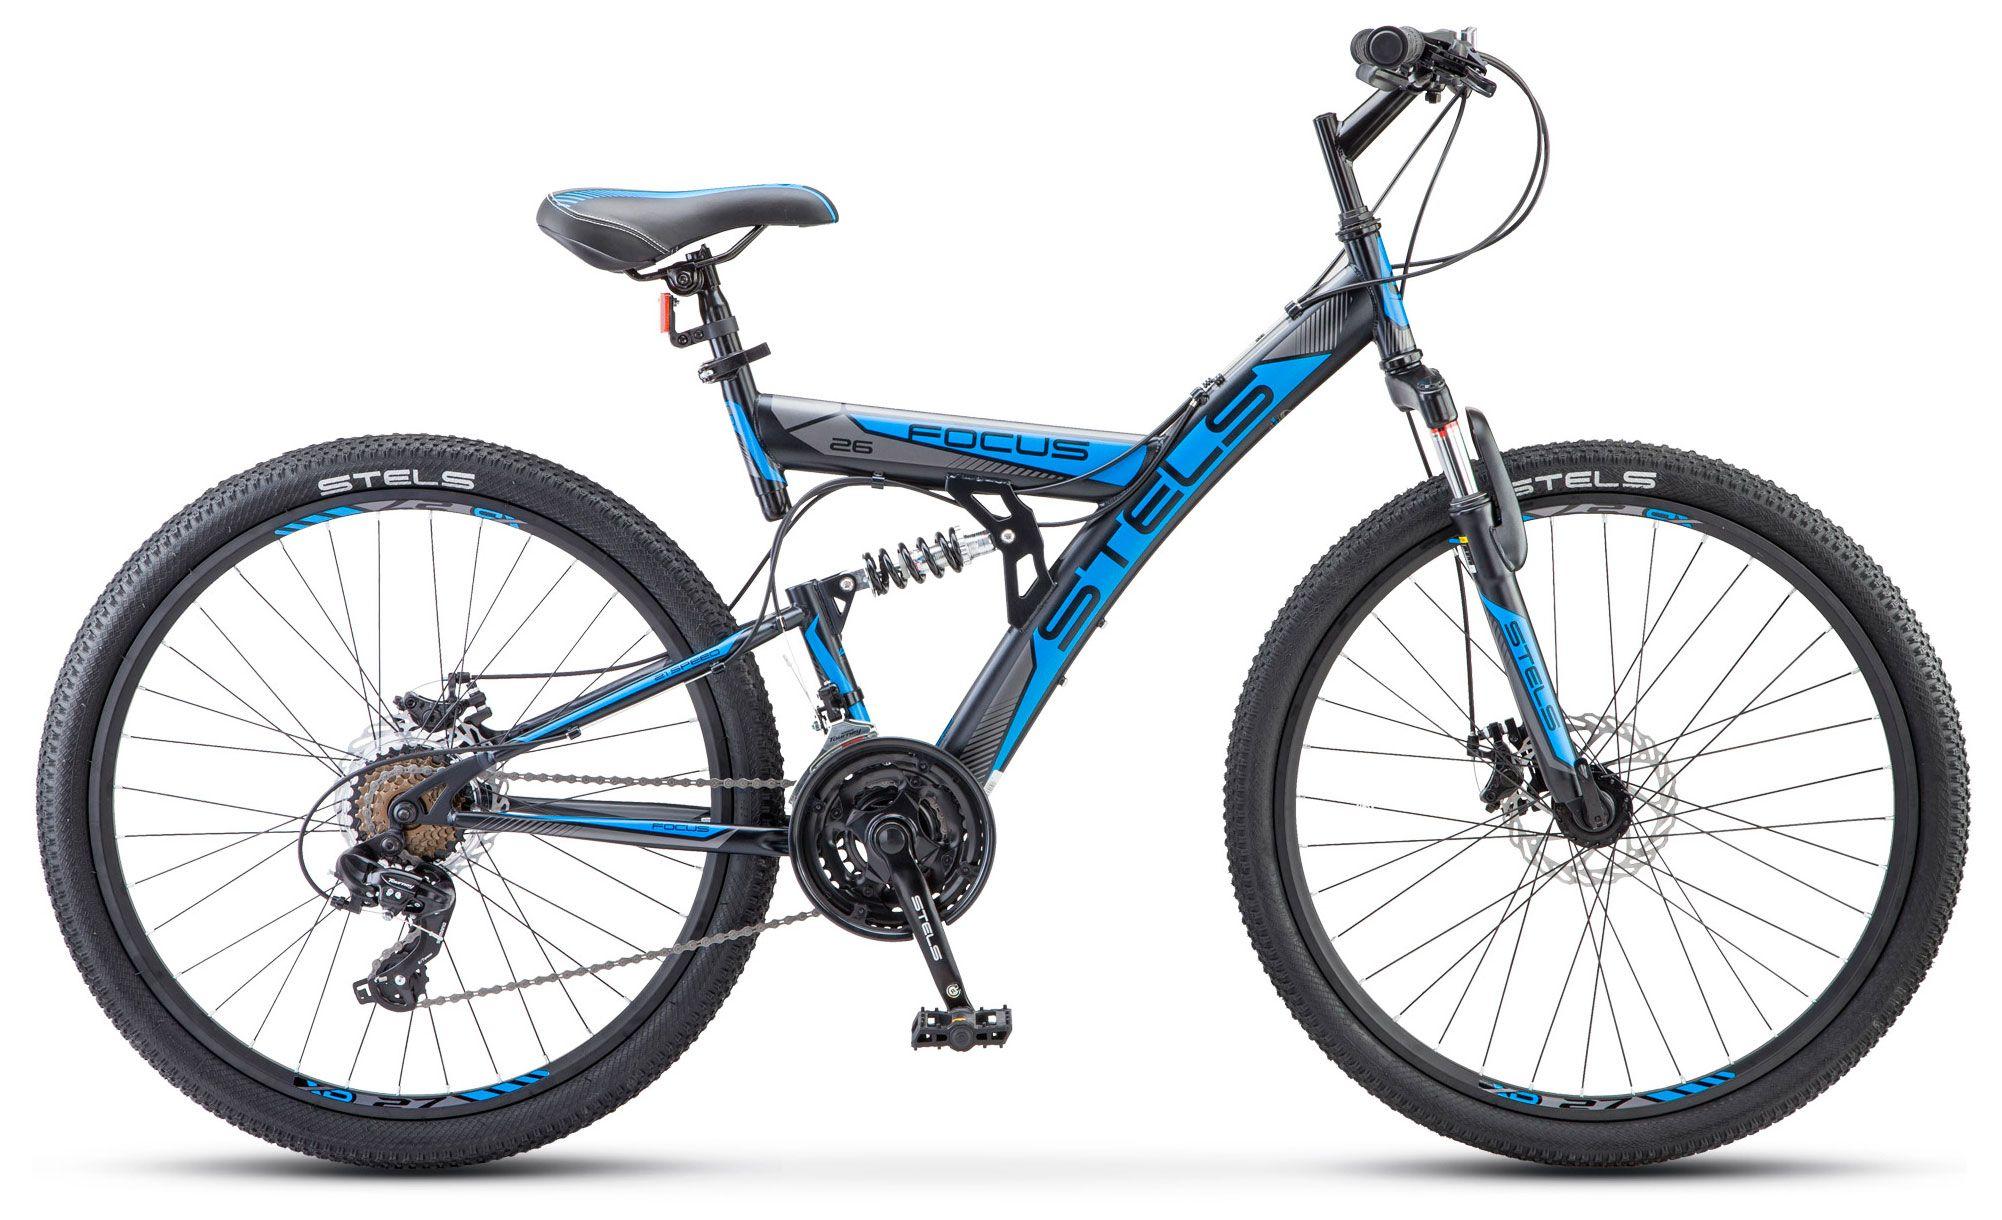 все цены на Велосипед Stels Focus MD 26 21-sp (V010) 2017 онлайн